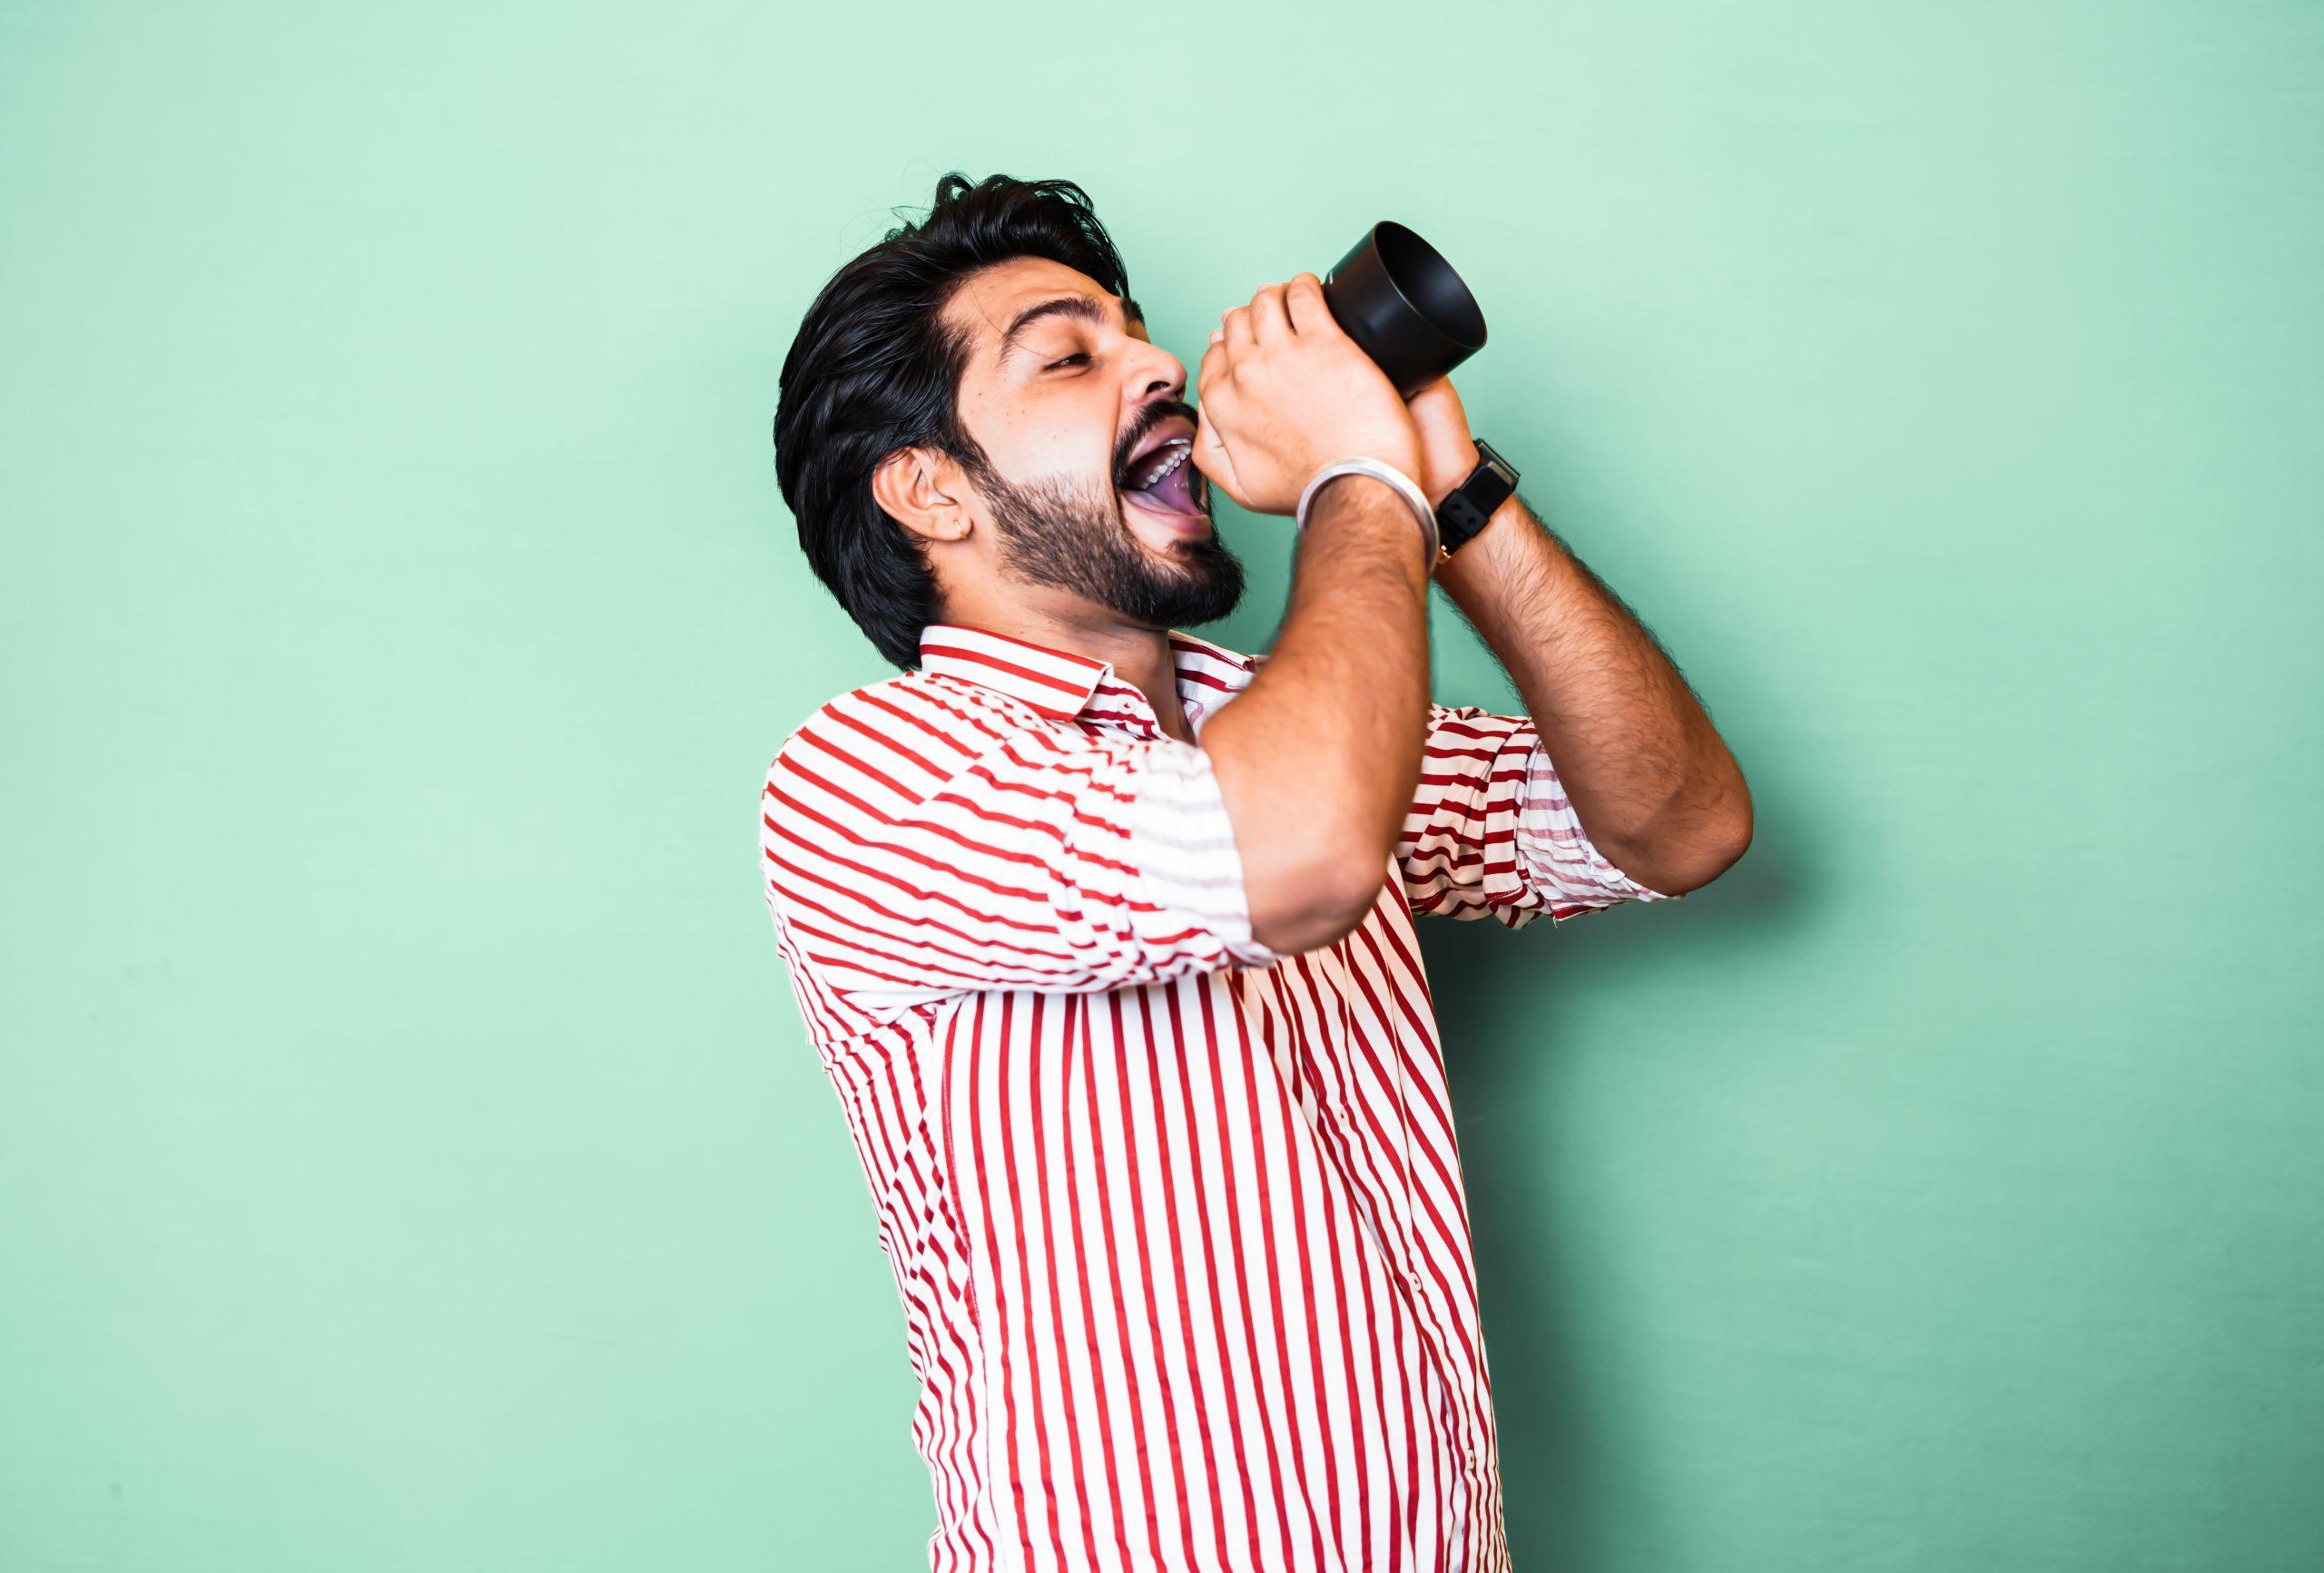 Boy in singing action